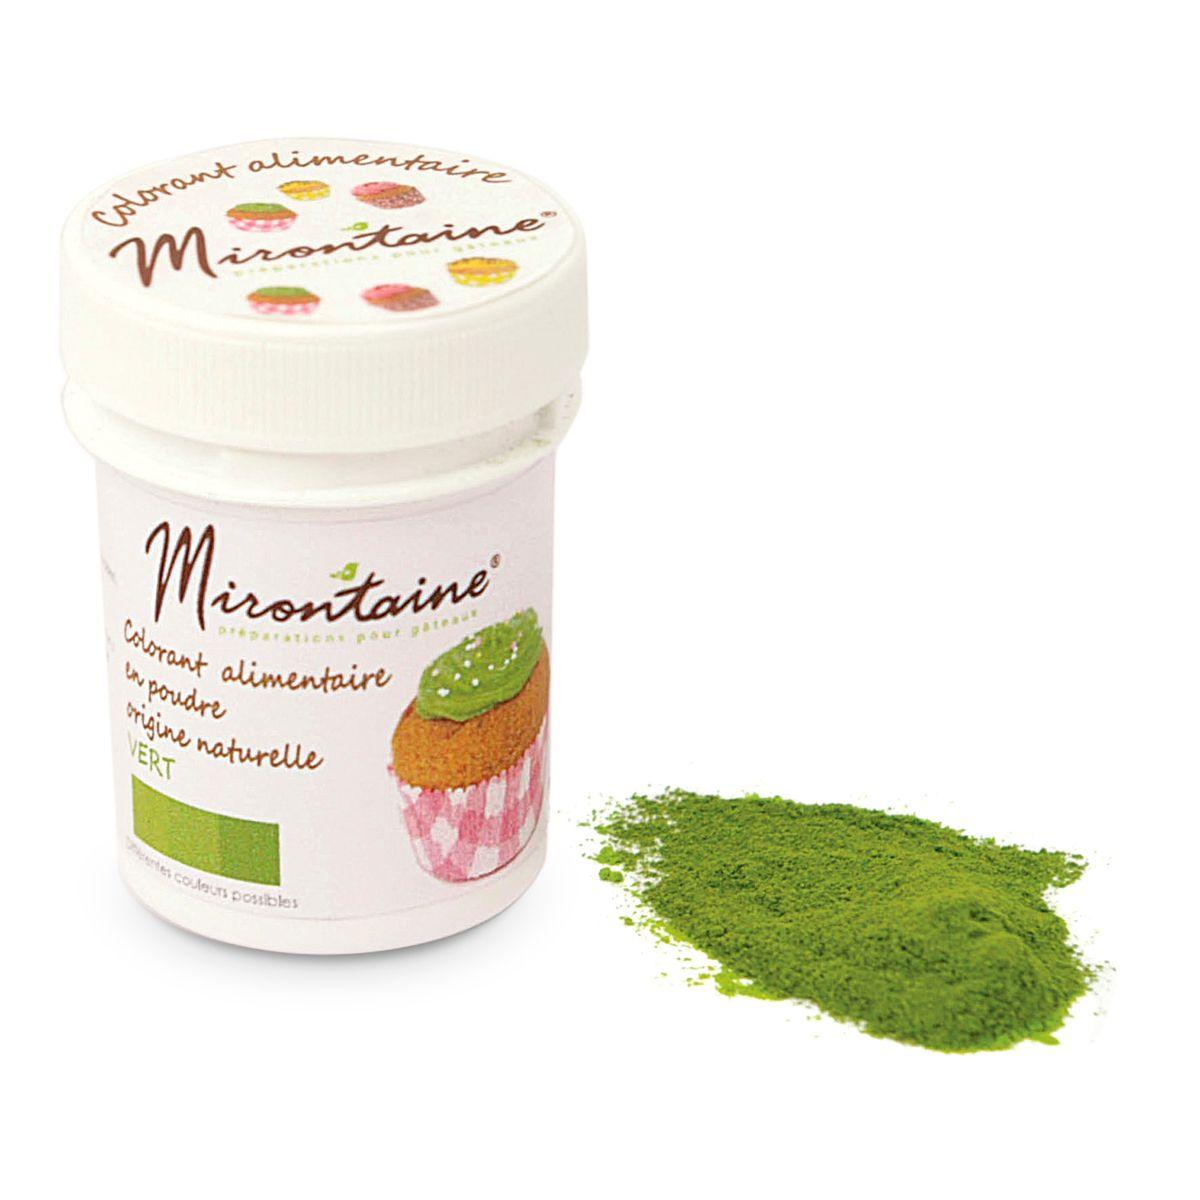 Colorant naturel alimentaire bio vert 10gr - Mirontaine